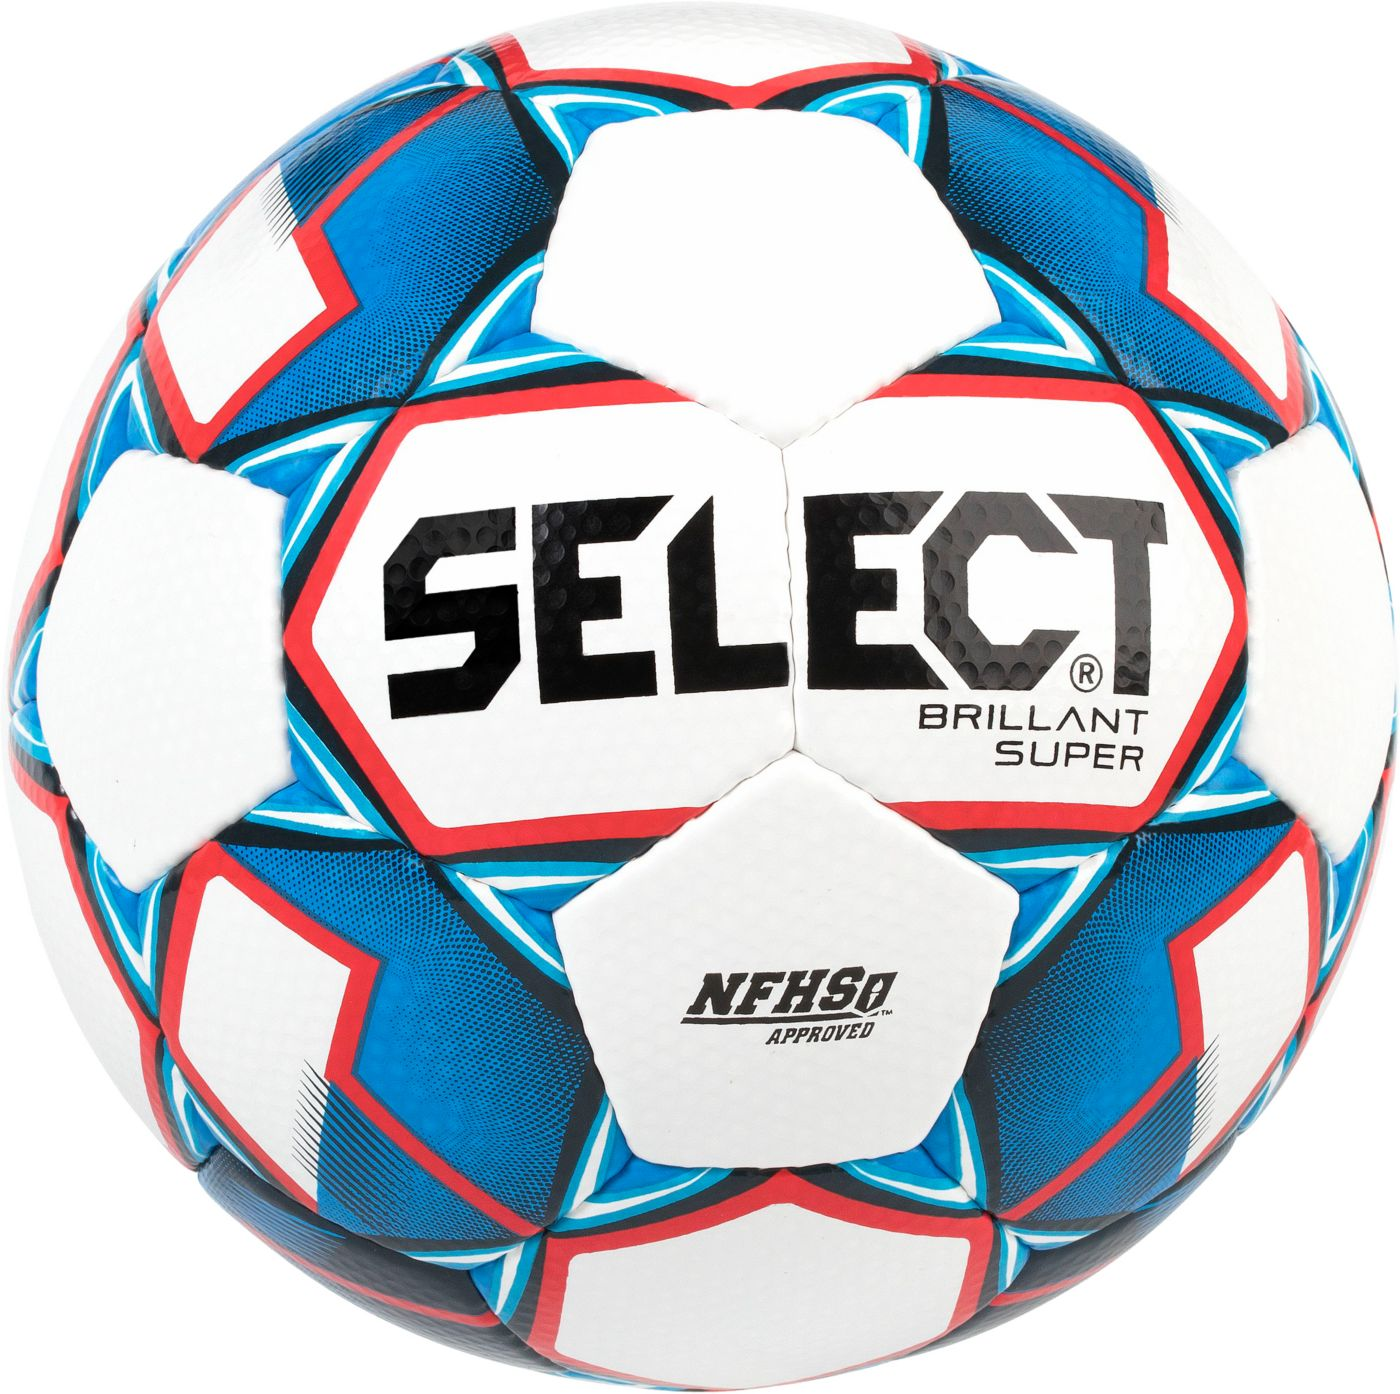 Select Brilliant Super NFHS 2018 Official Match Soccer Ball